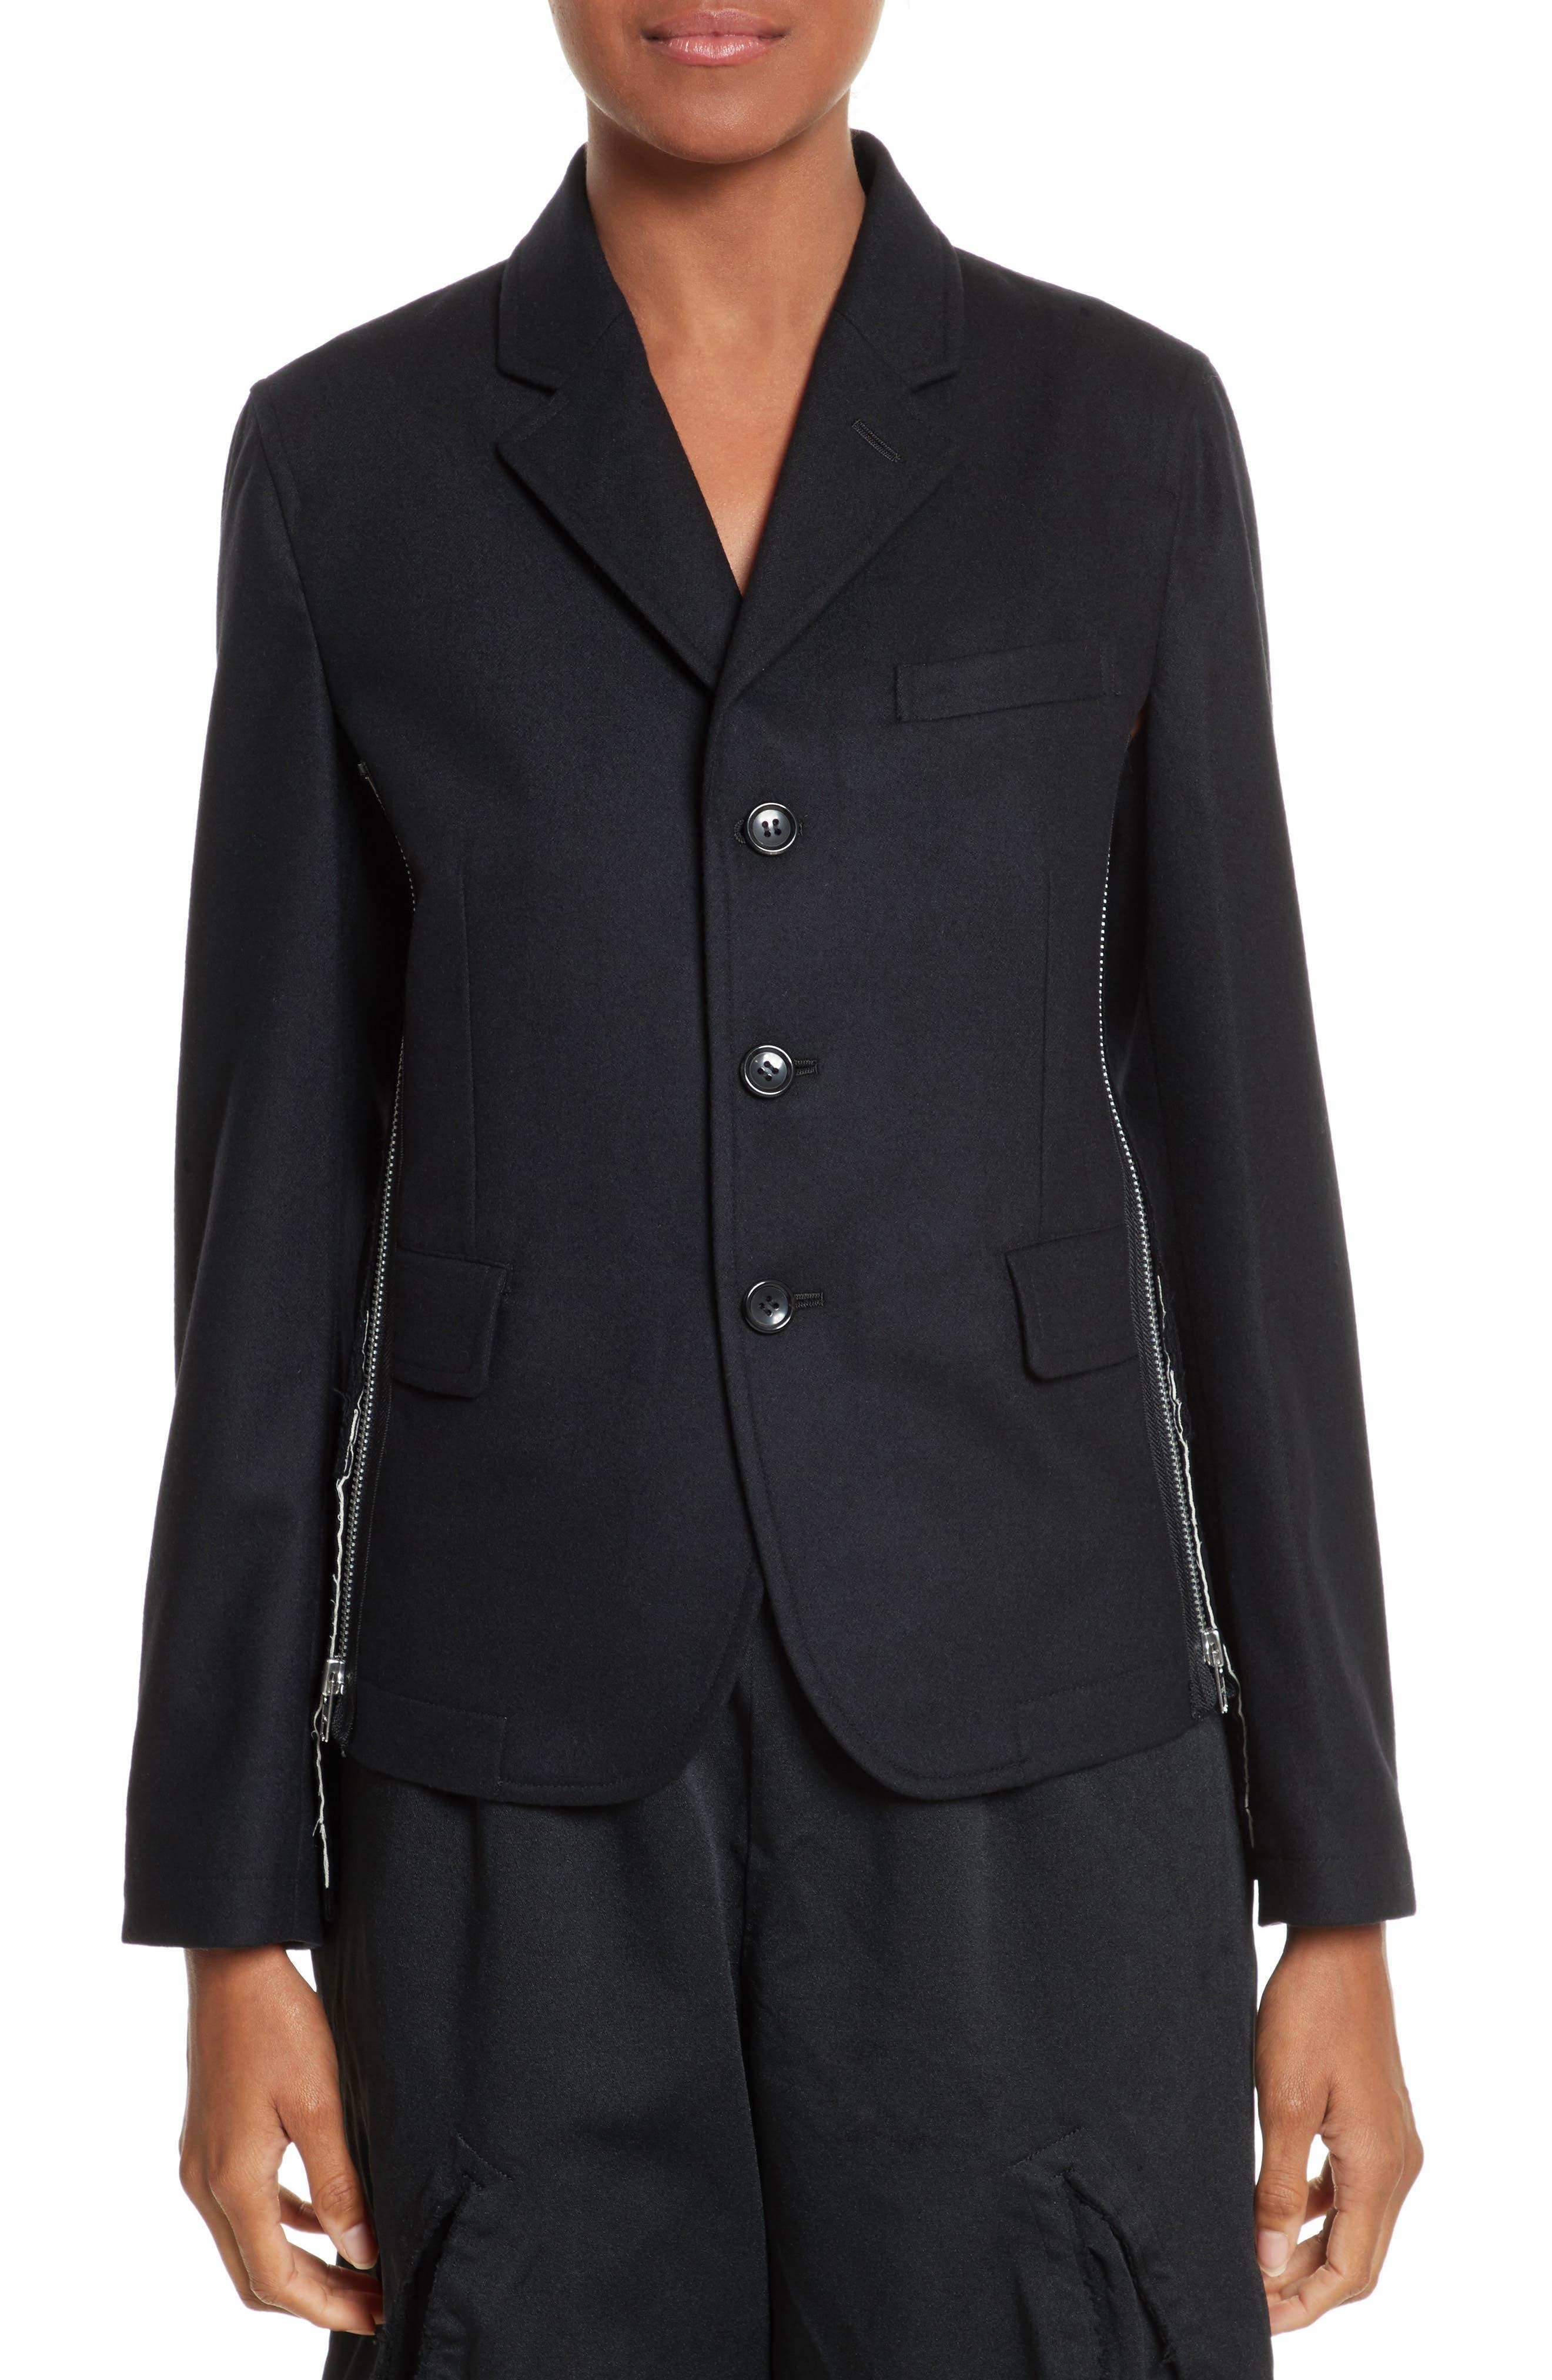 Main Image - Comme des Garçons Zip Detail Wool Jacket